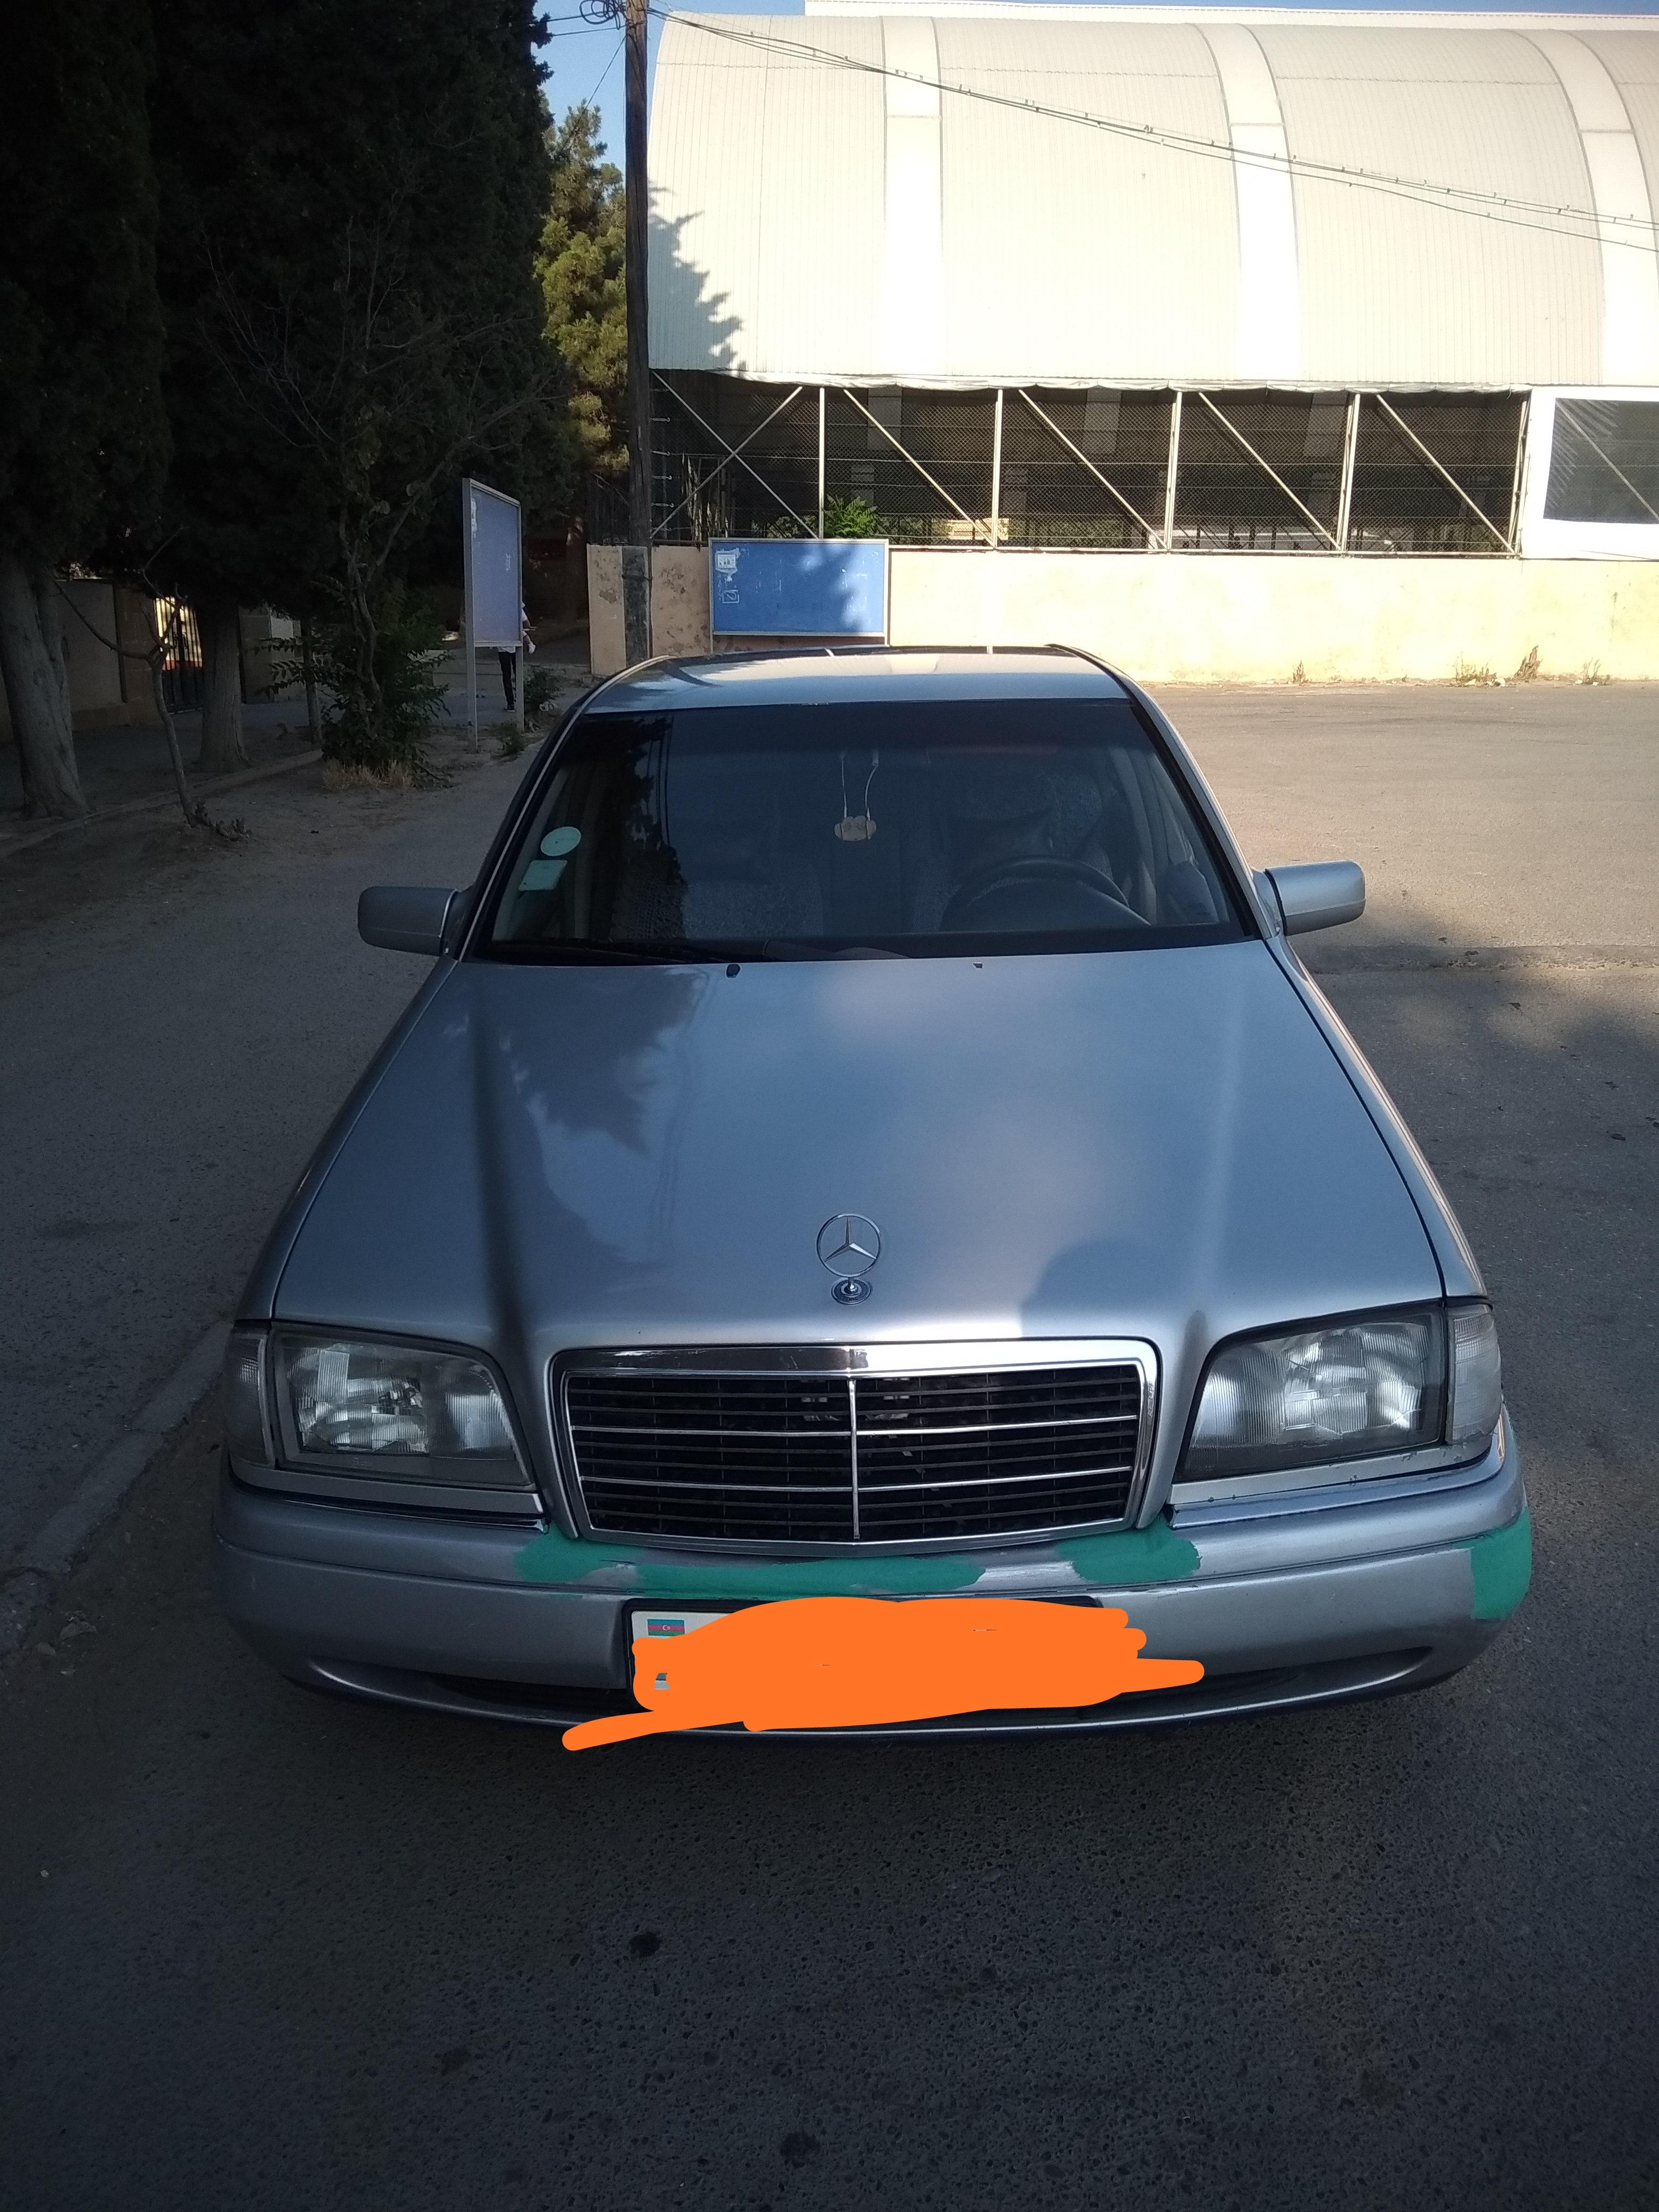 Mercedes-Benz C 220 2.2(lt) 1994 İkinci əl  $8500